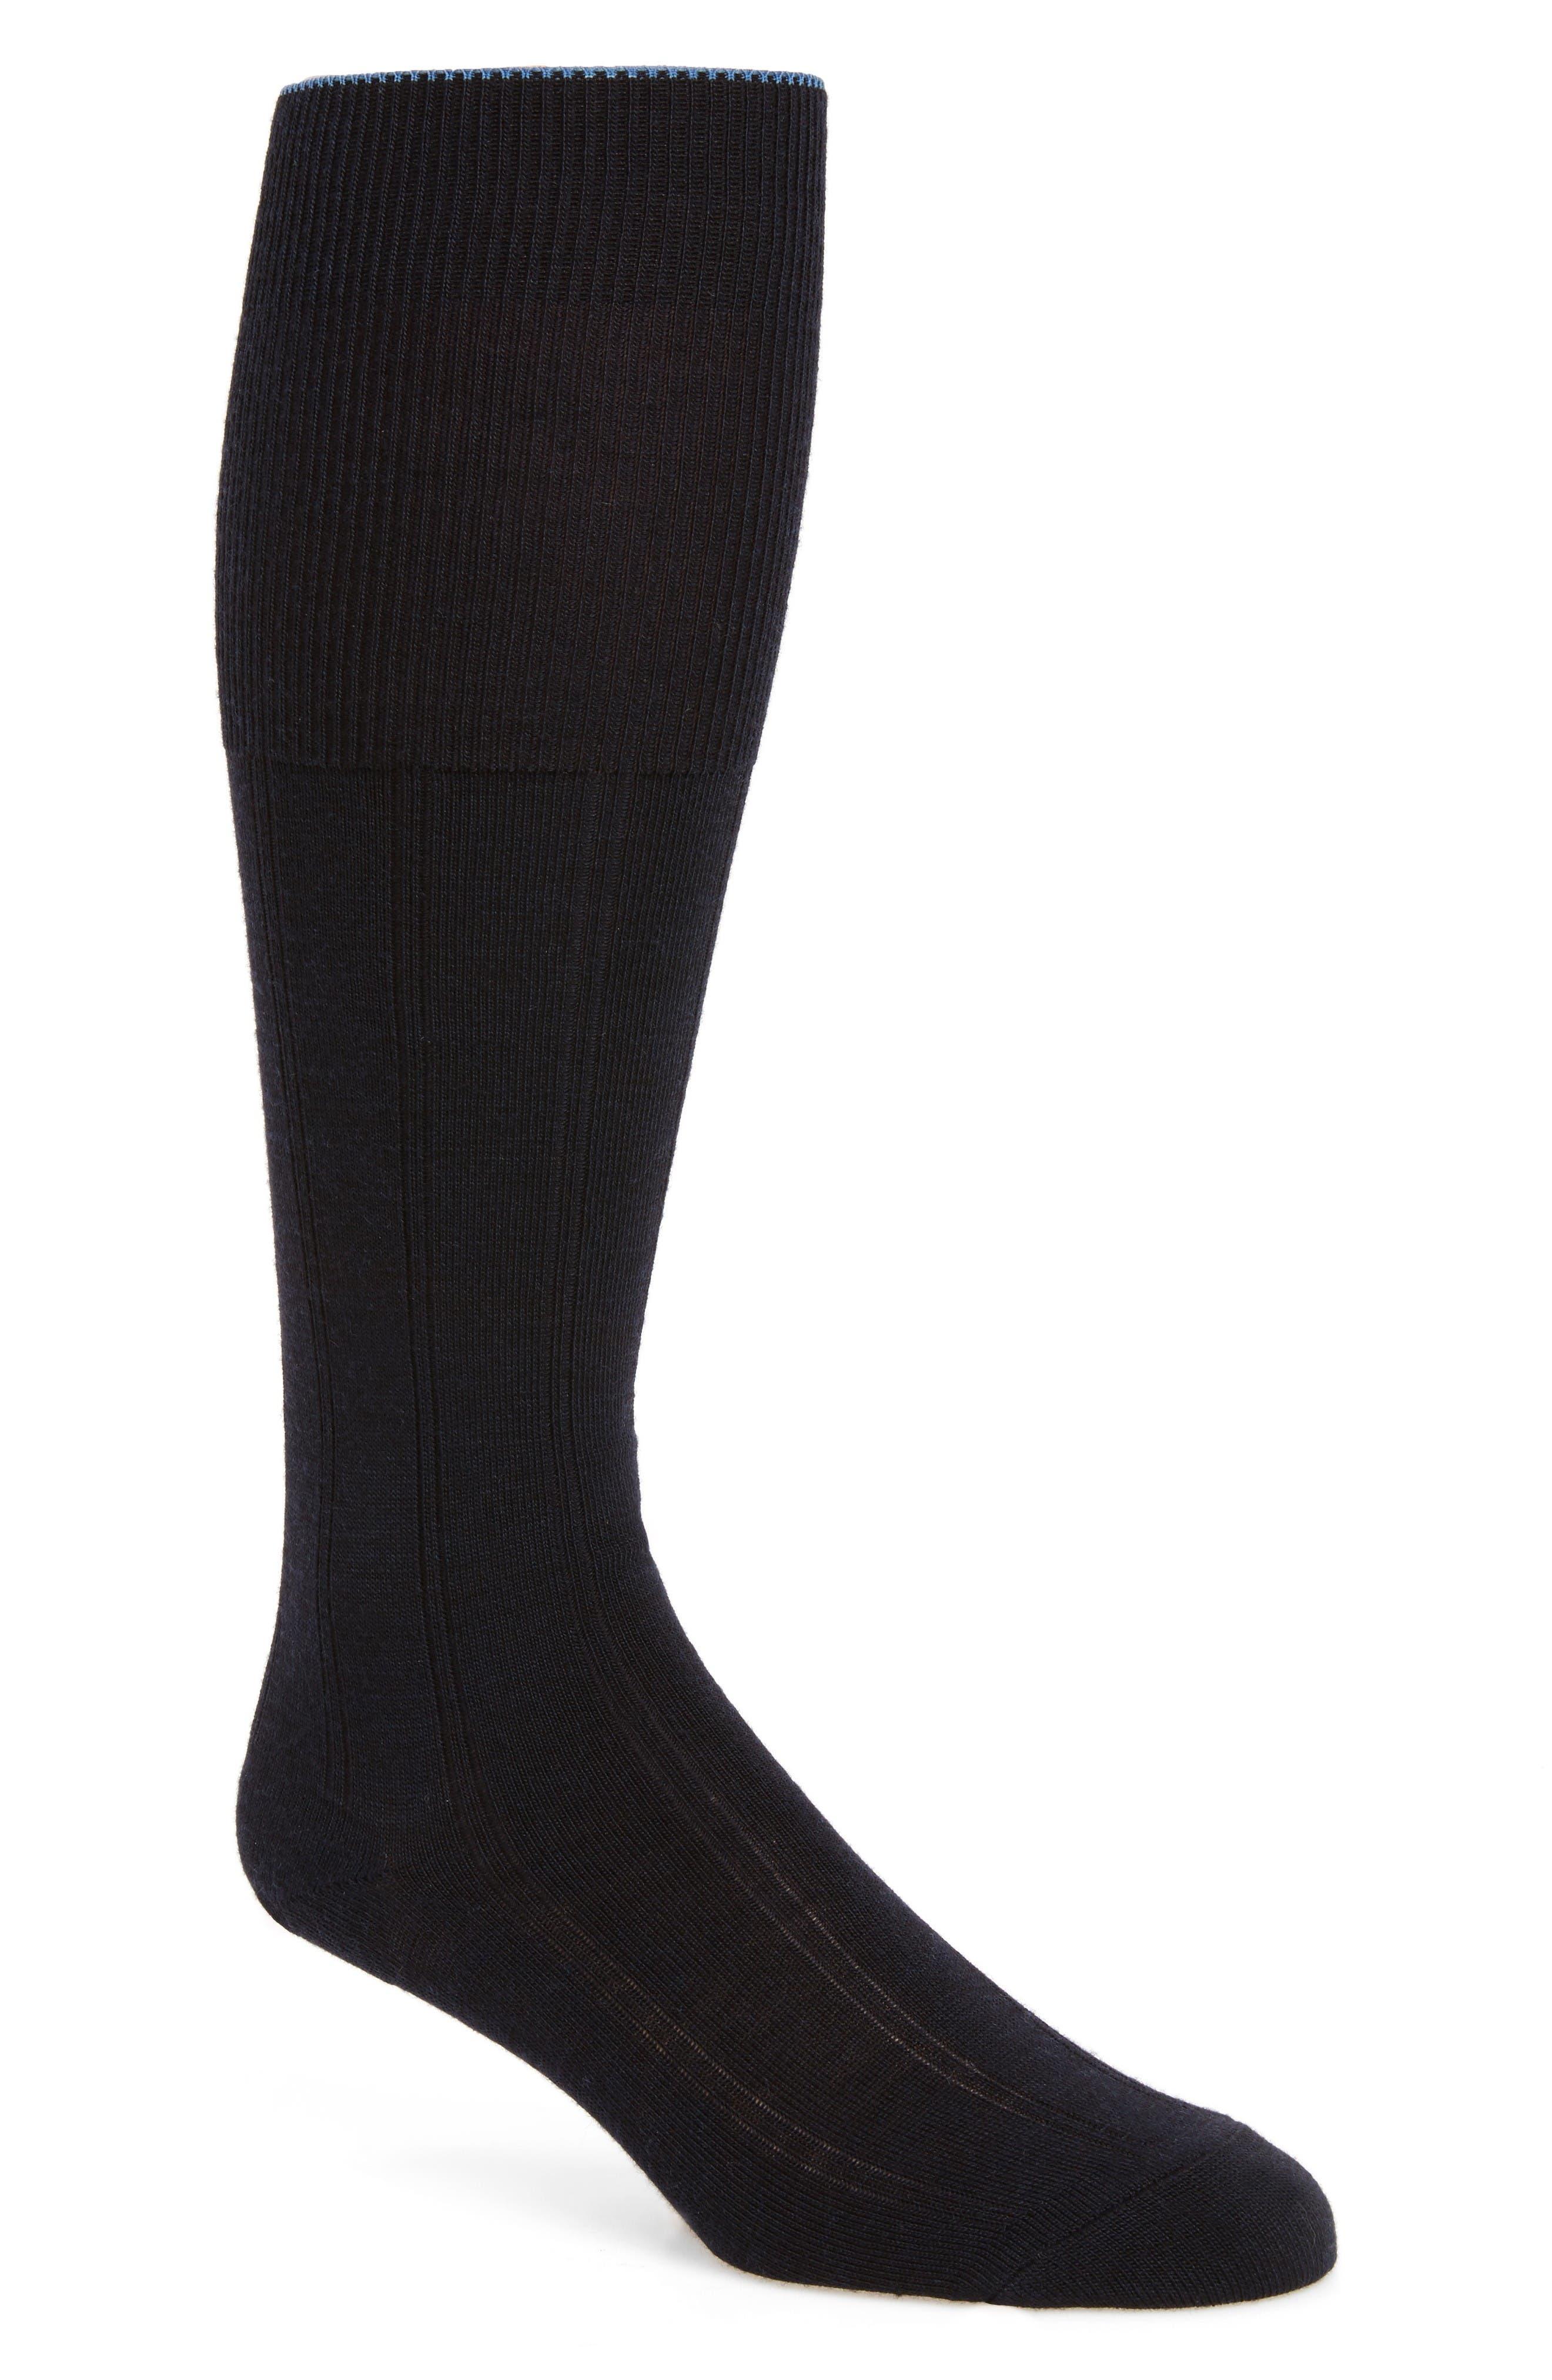 Nordstrom Mens Shop Over the Calf Wool Socks (Men) (3 for $35)